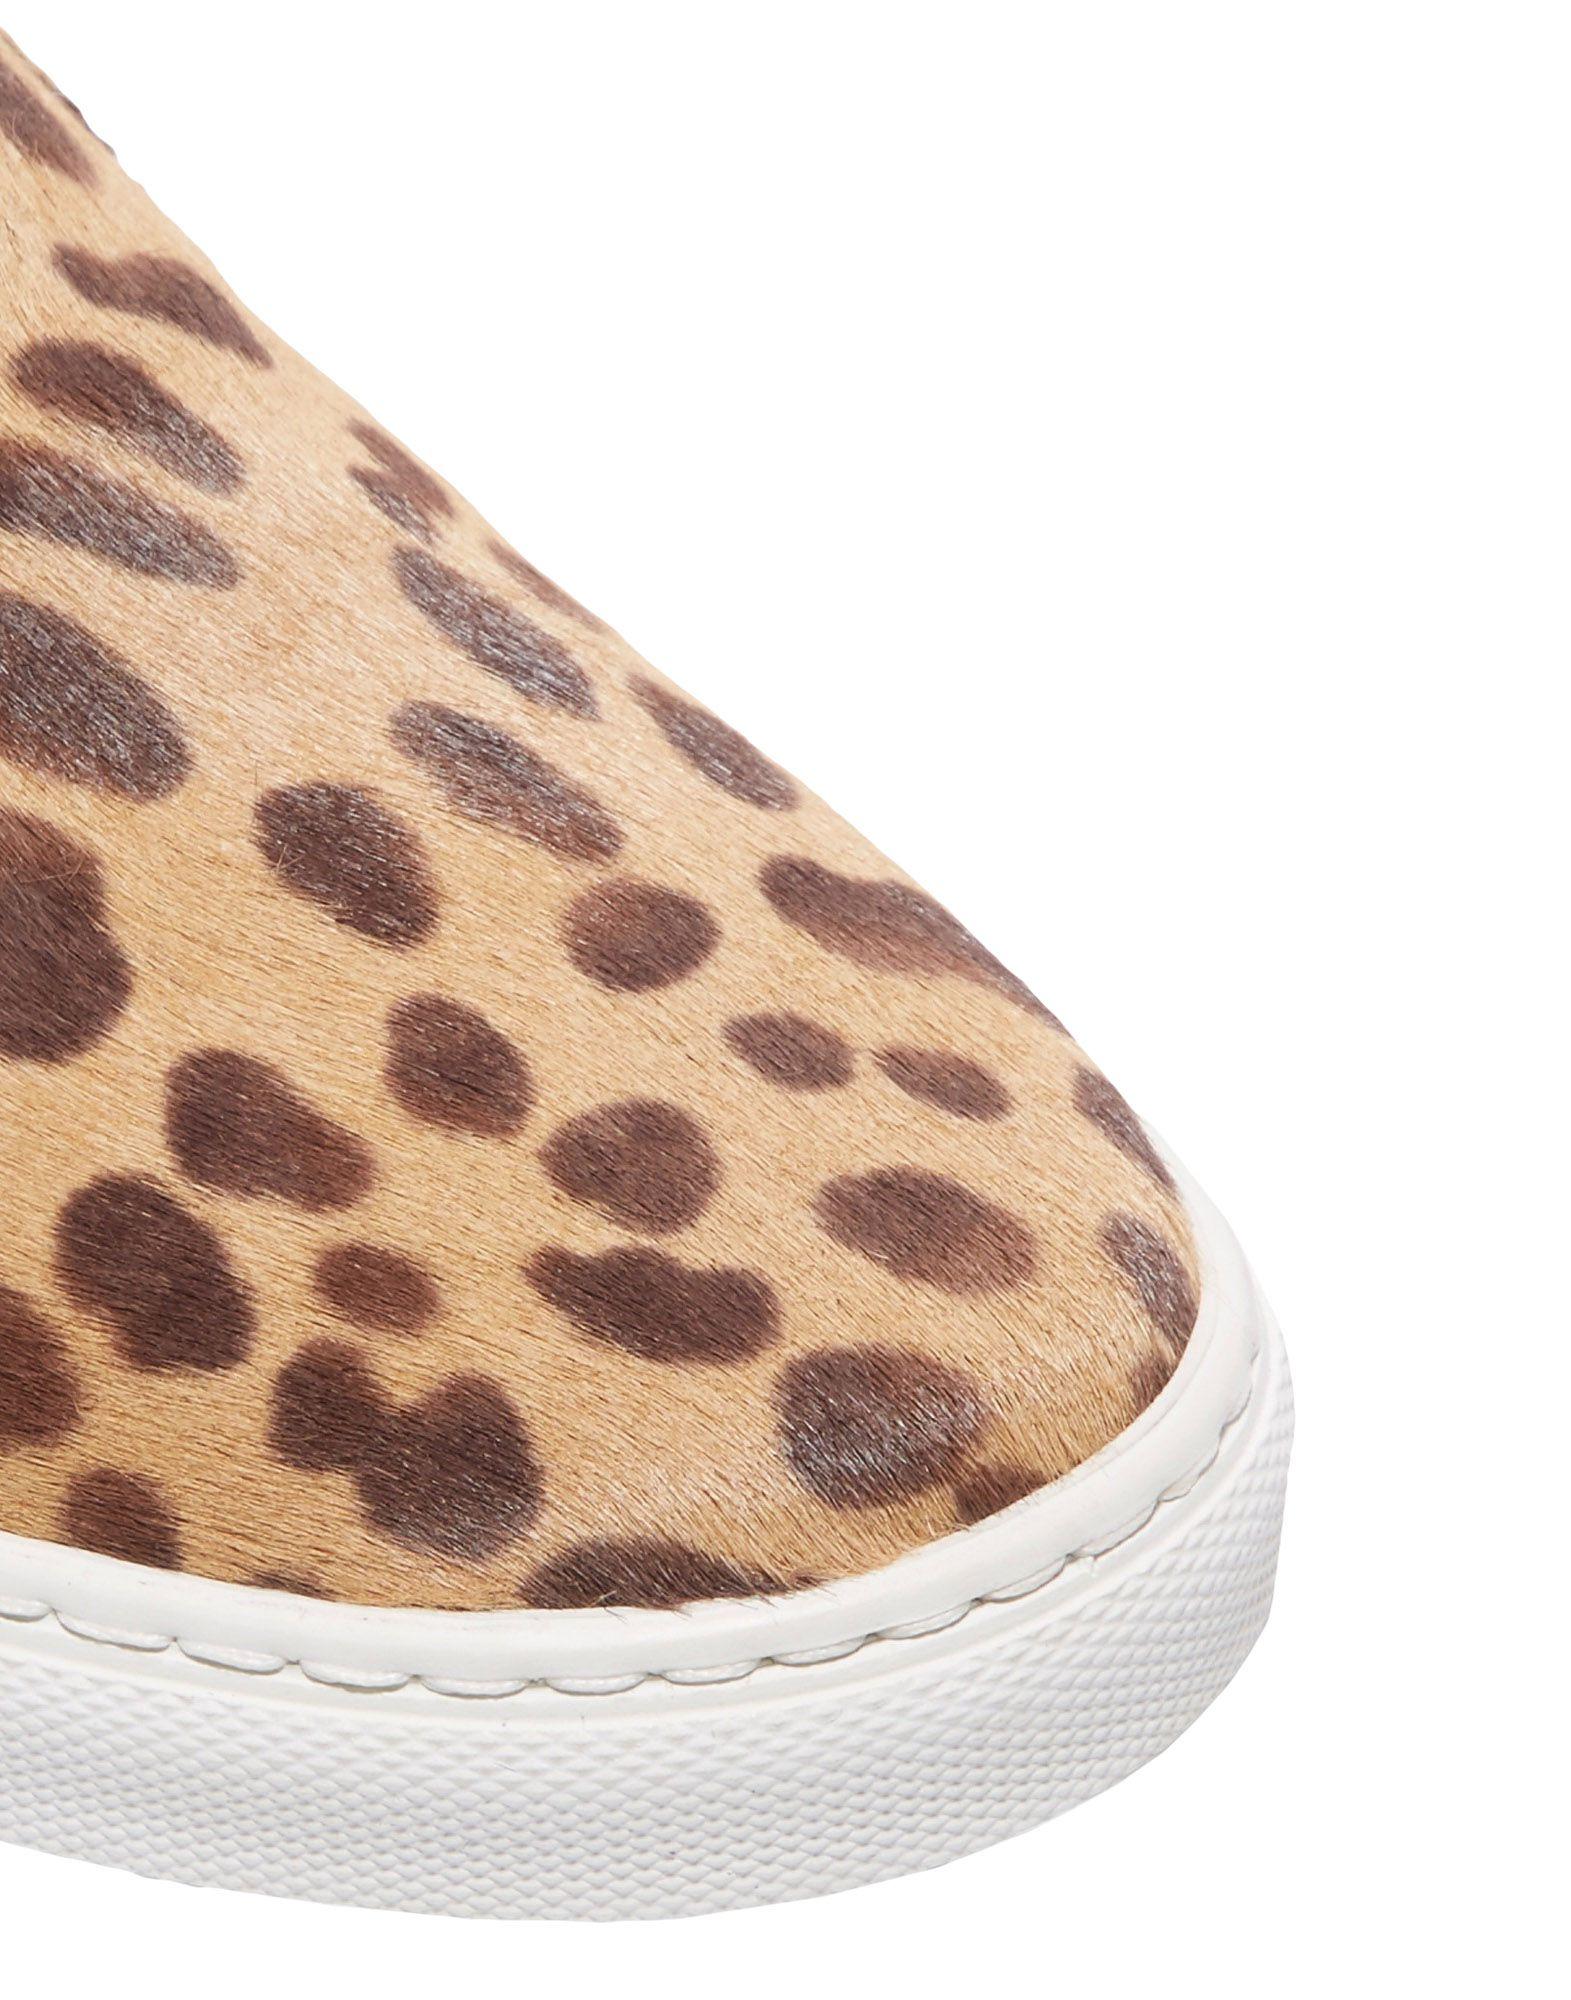 Rabatt Schuhe Lanvin Sneakers Damen  11530000GK